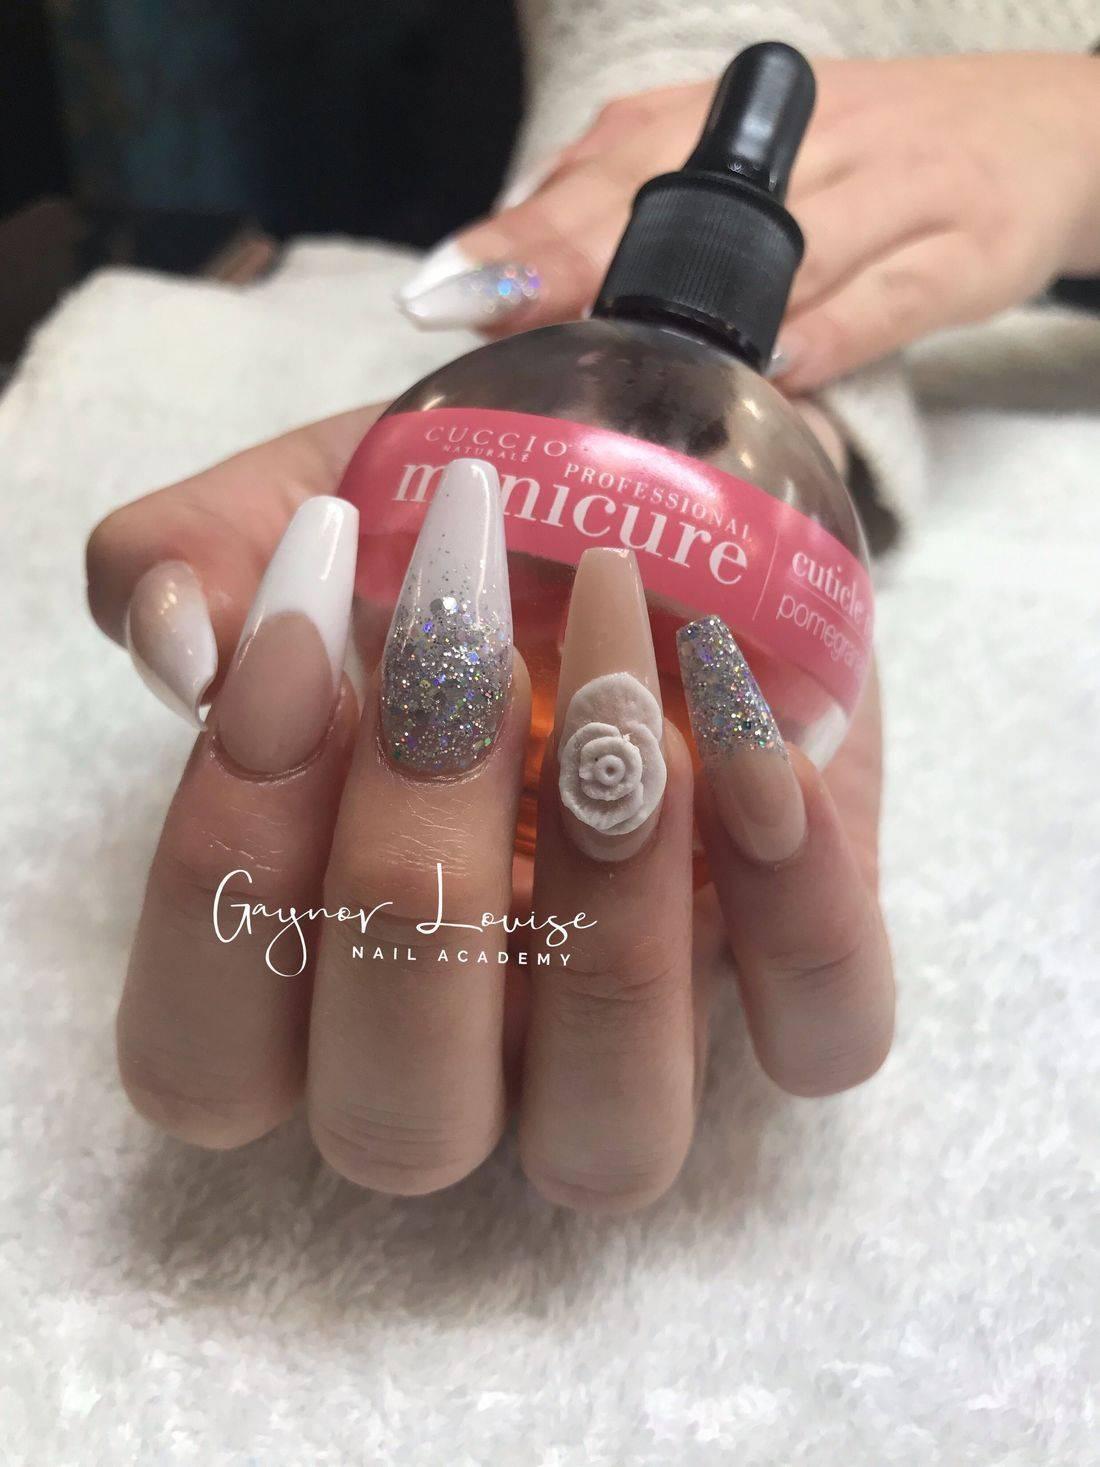 gaynor louise nail academy, manicure training bury, manchester, north west  pedicure training bury, manchester, north west, nail training, cuccio nail courses,